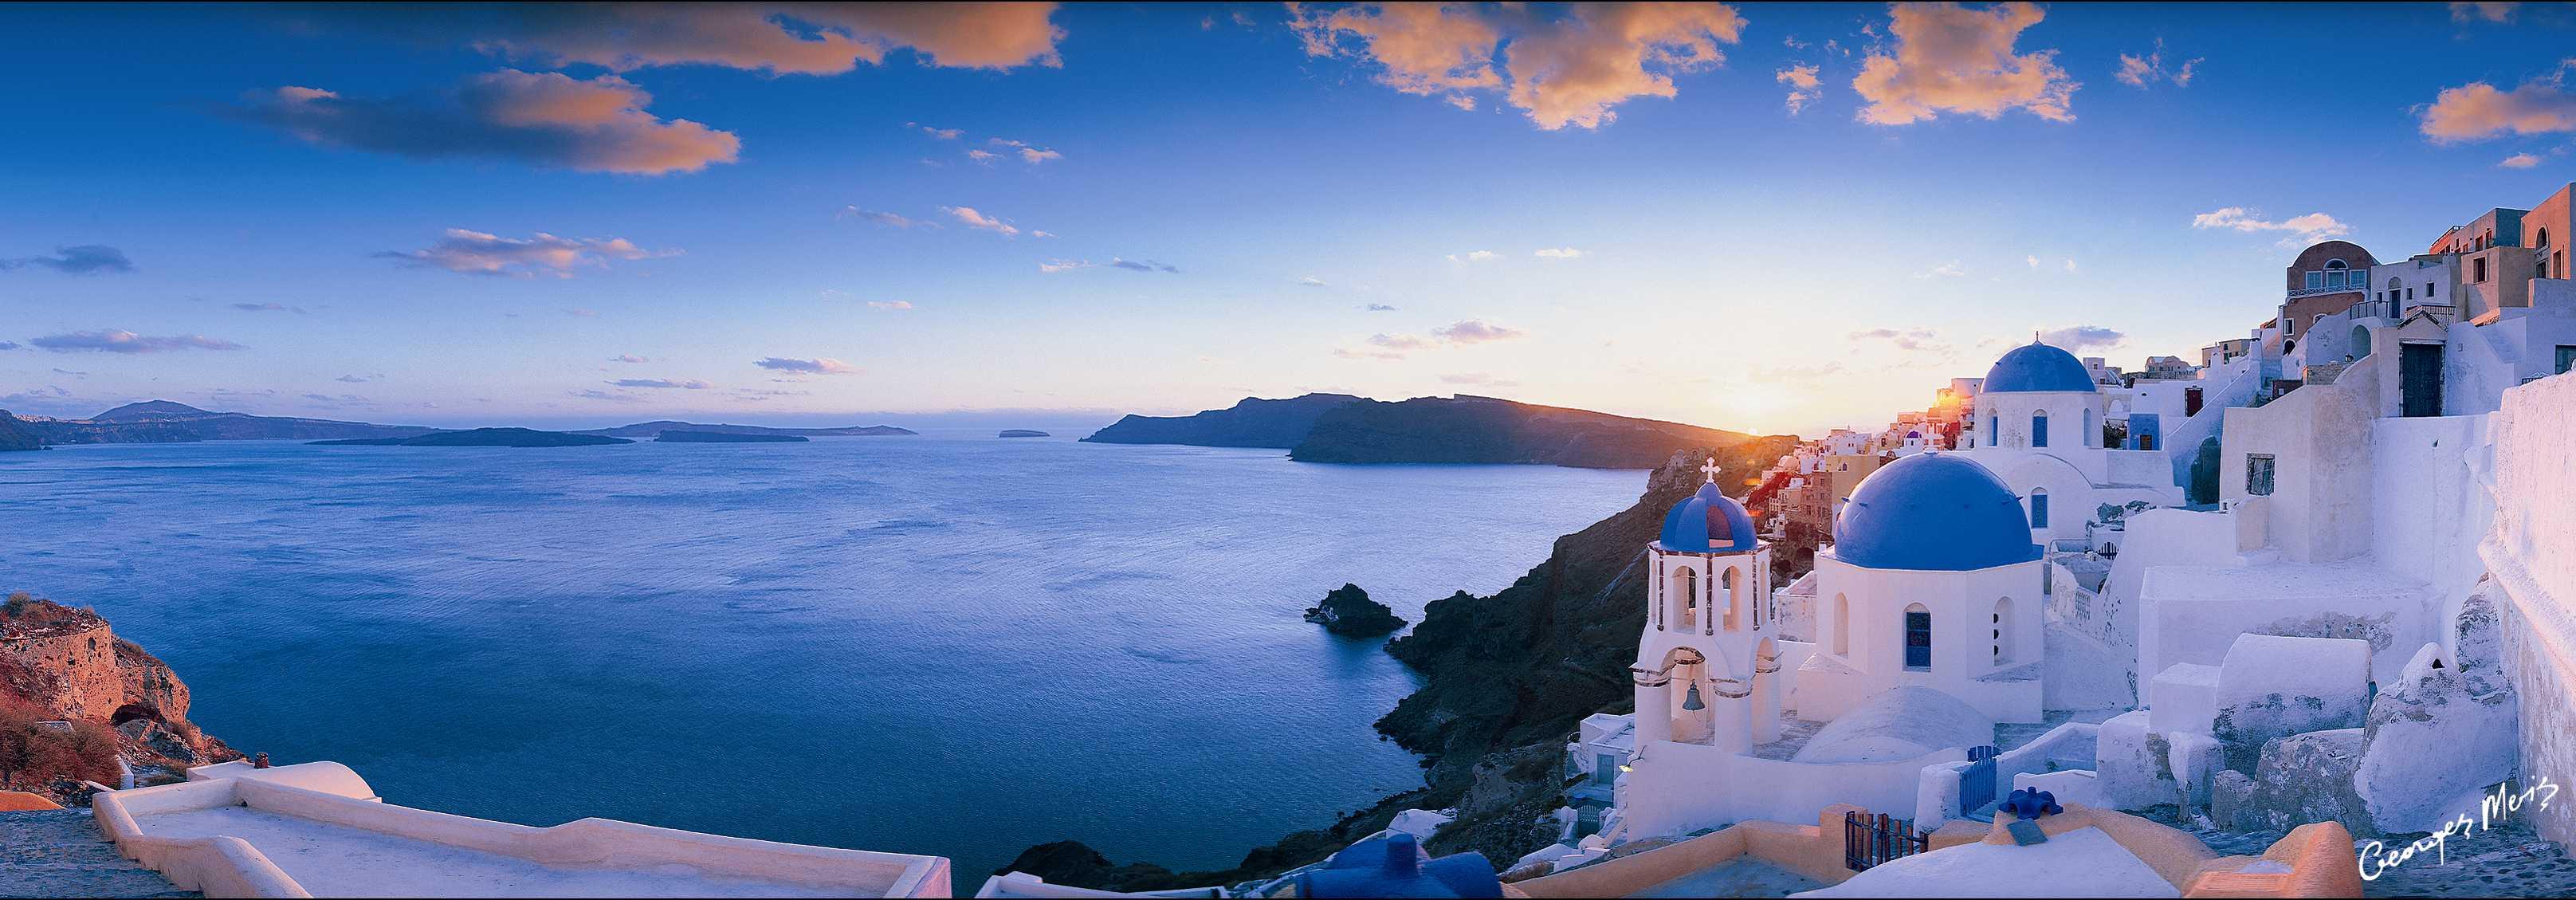 oia greece santorini wallpaper - photo #5